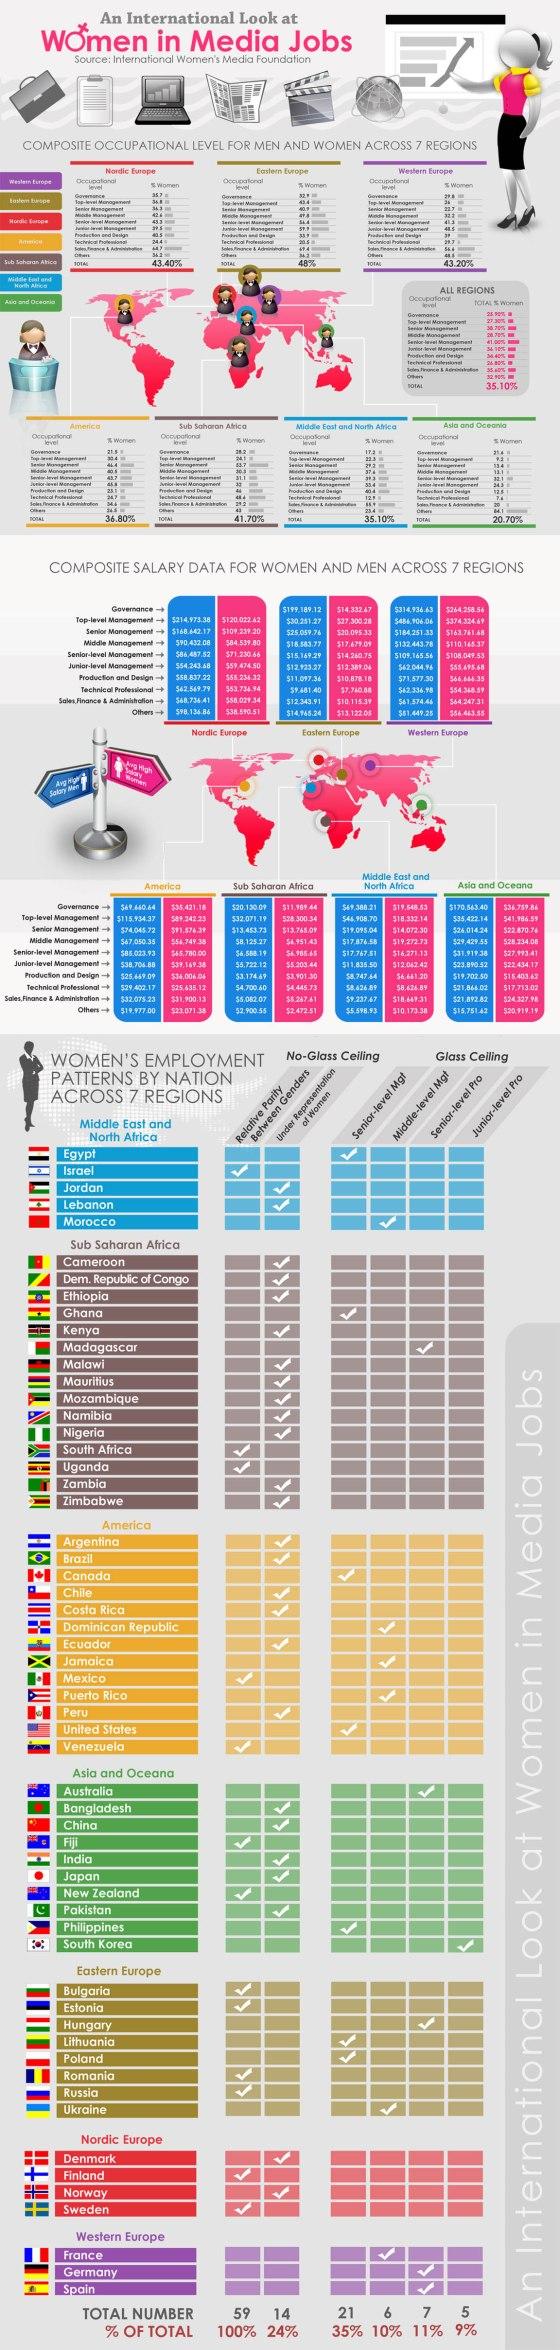 An International Look at Women in Media Jobs